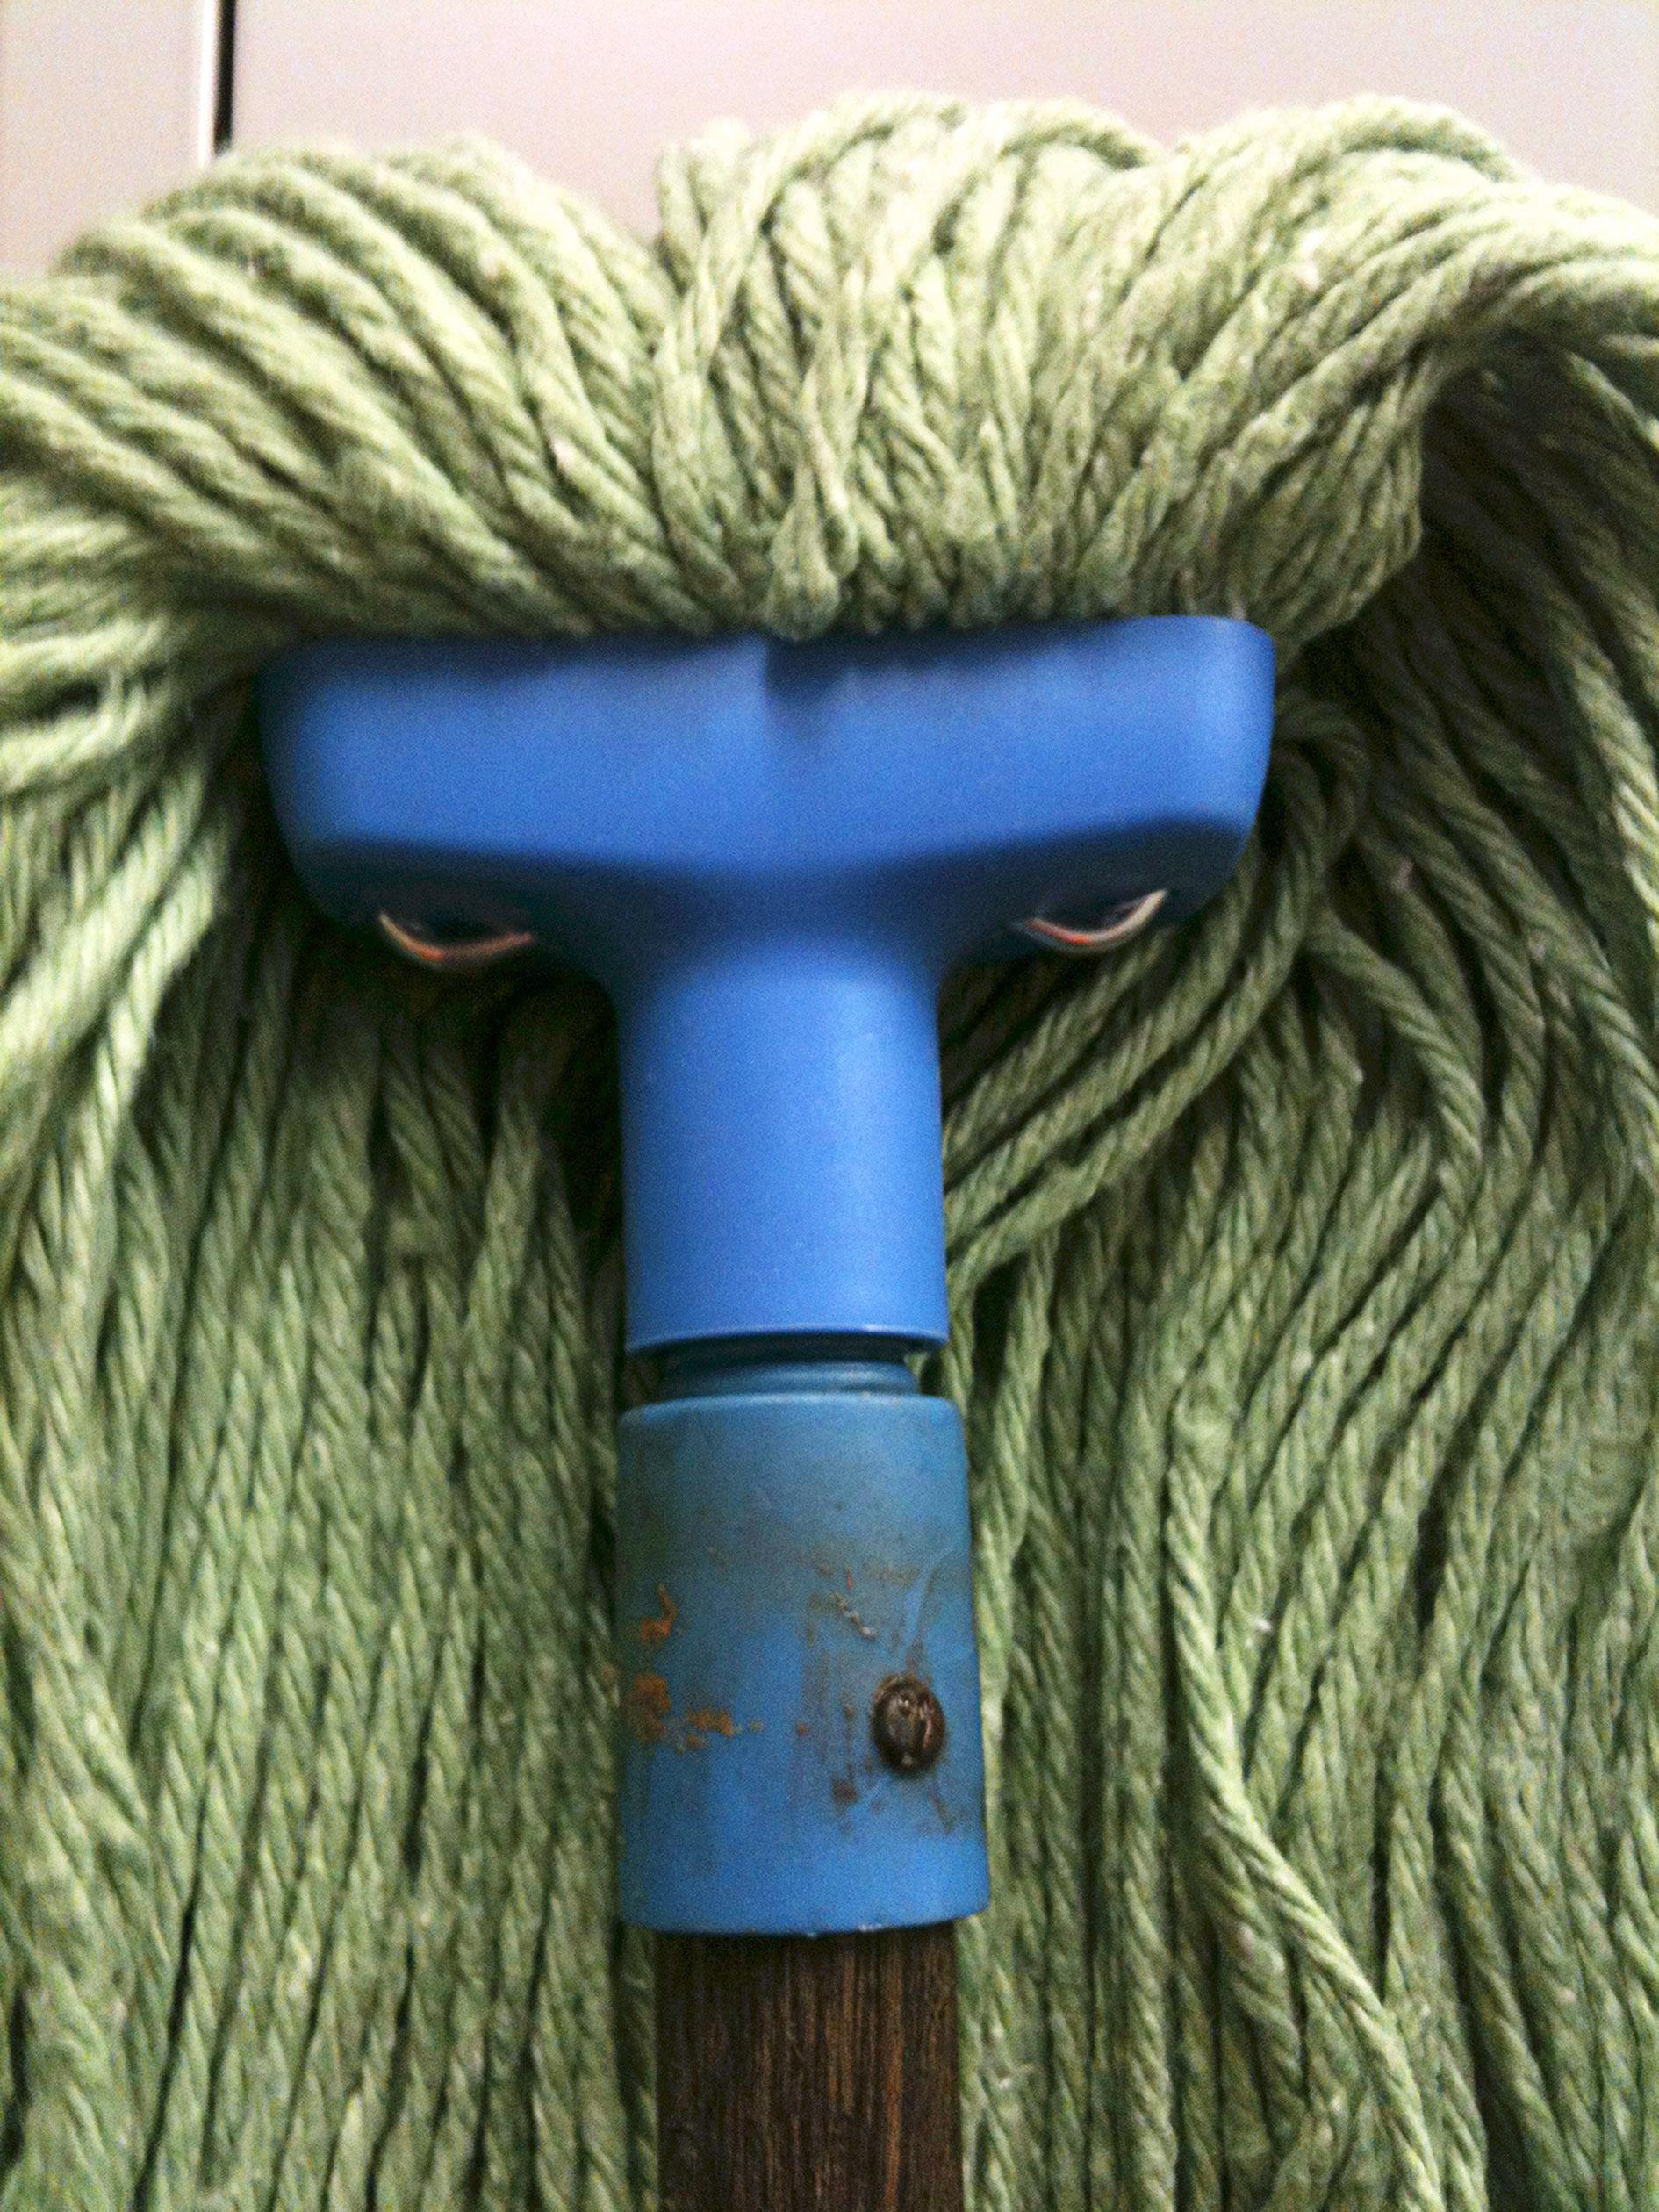 sweeper-s1890x2520-446831